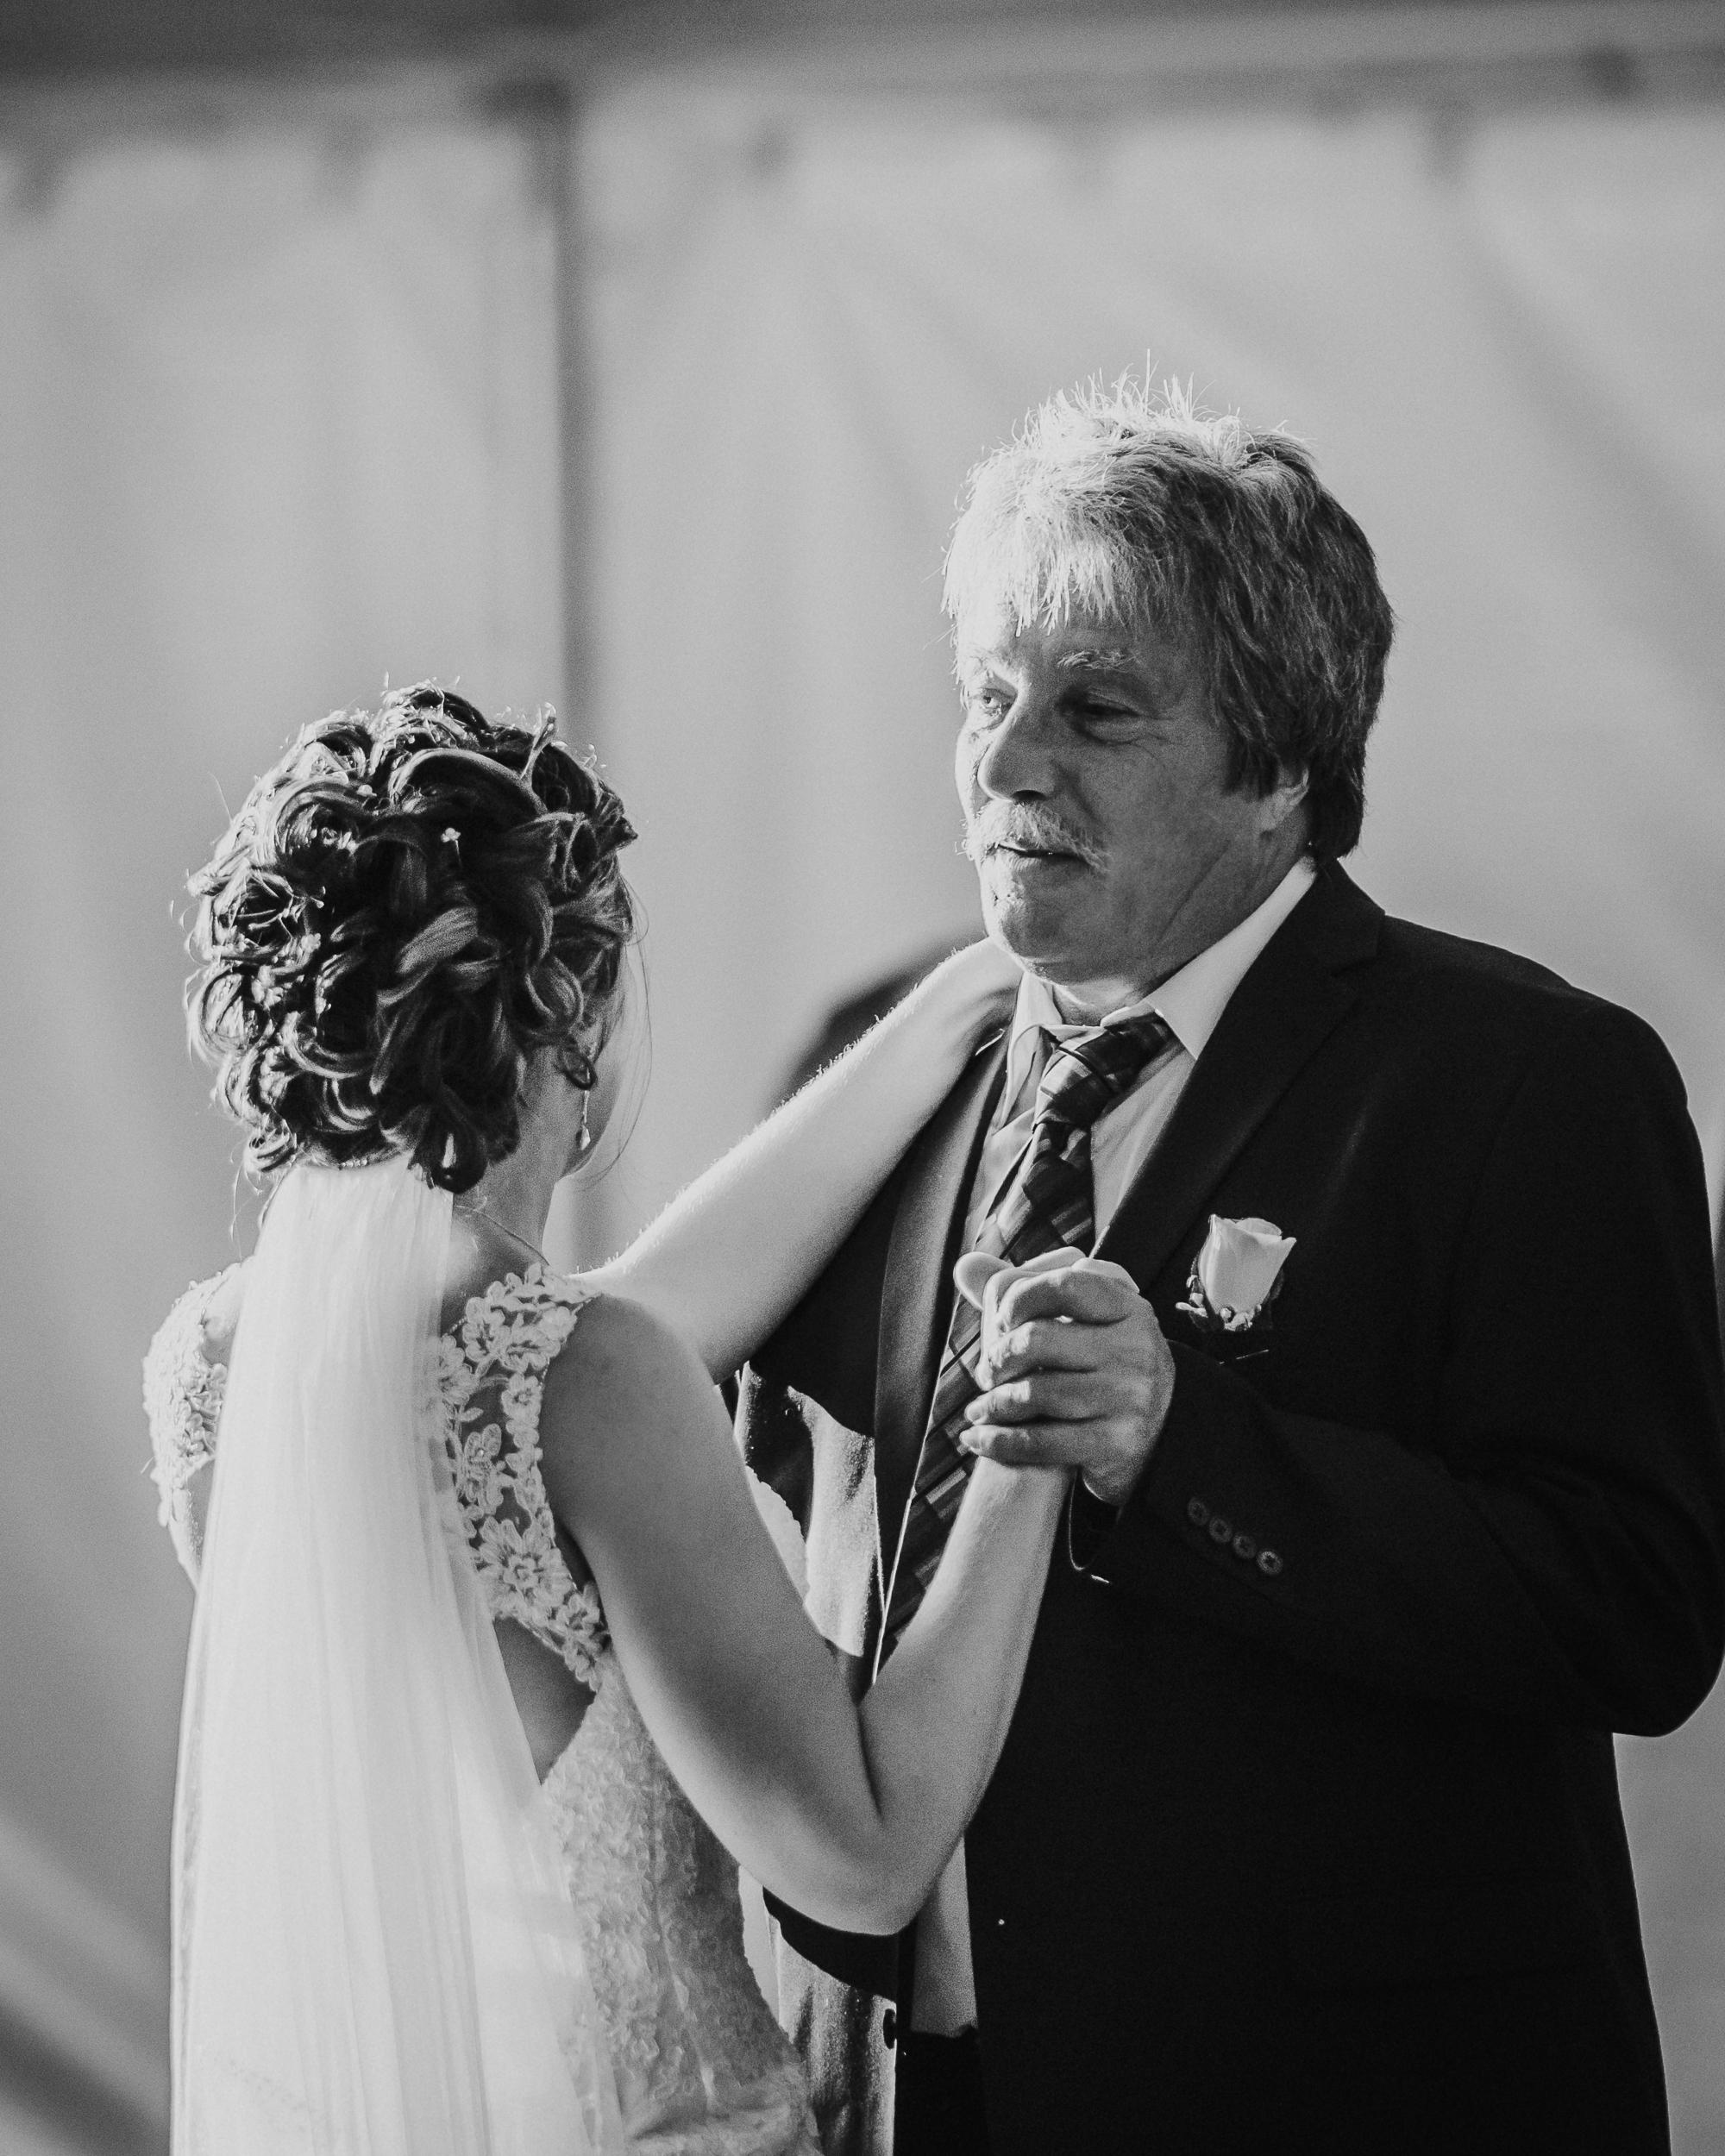 Christina-and-Gene-Wedding-Marla-Rain-Photography-546.jpg